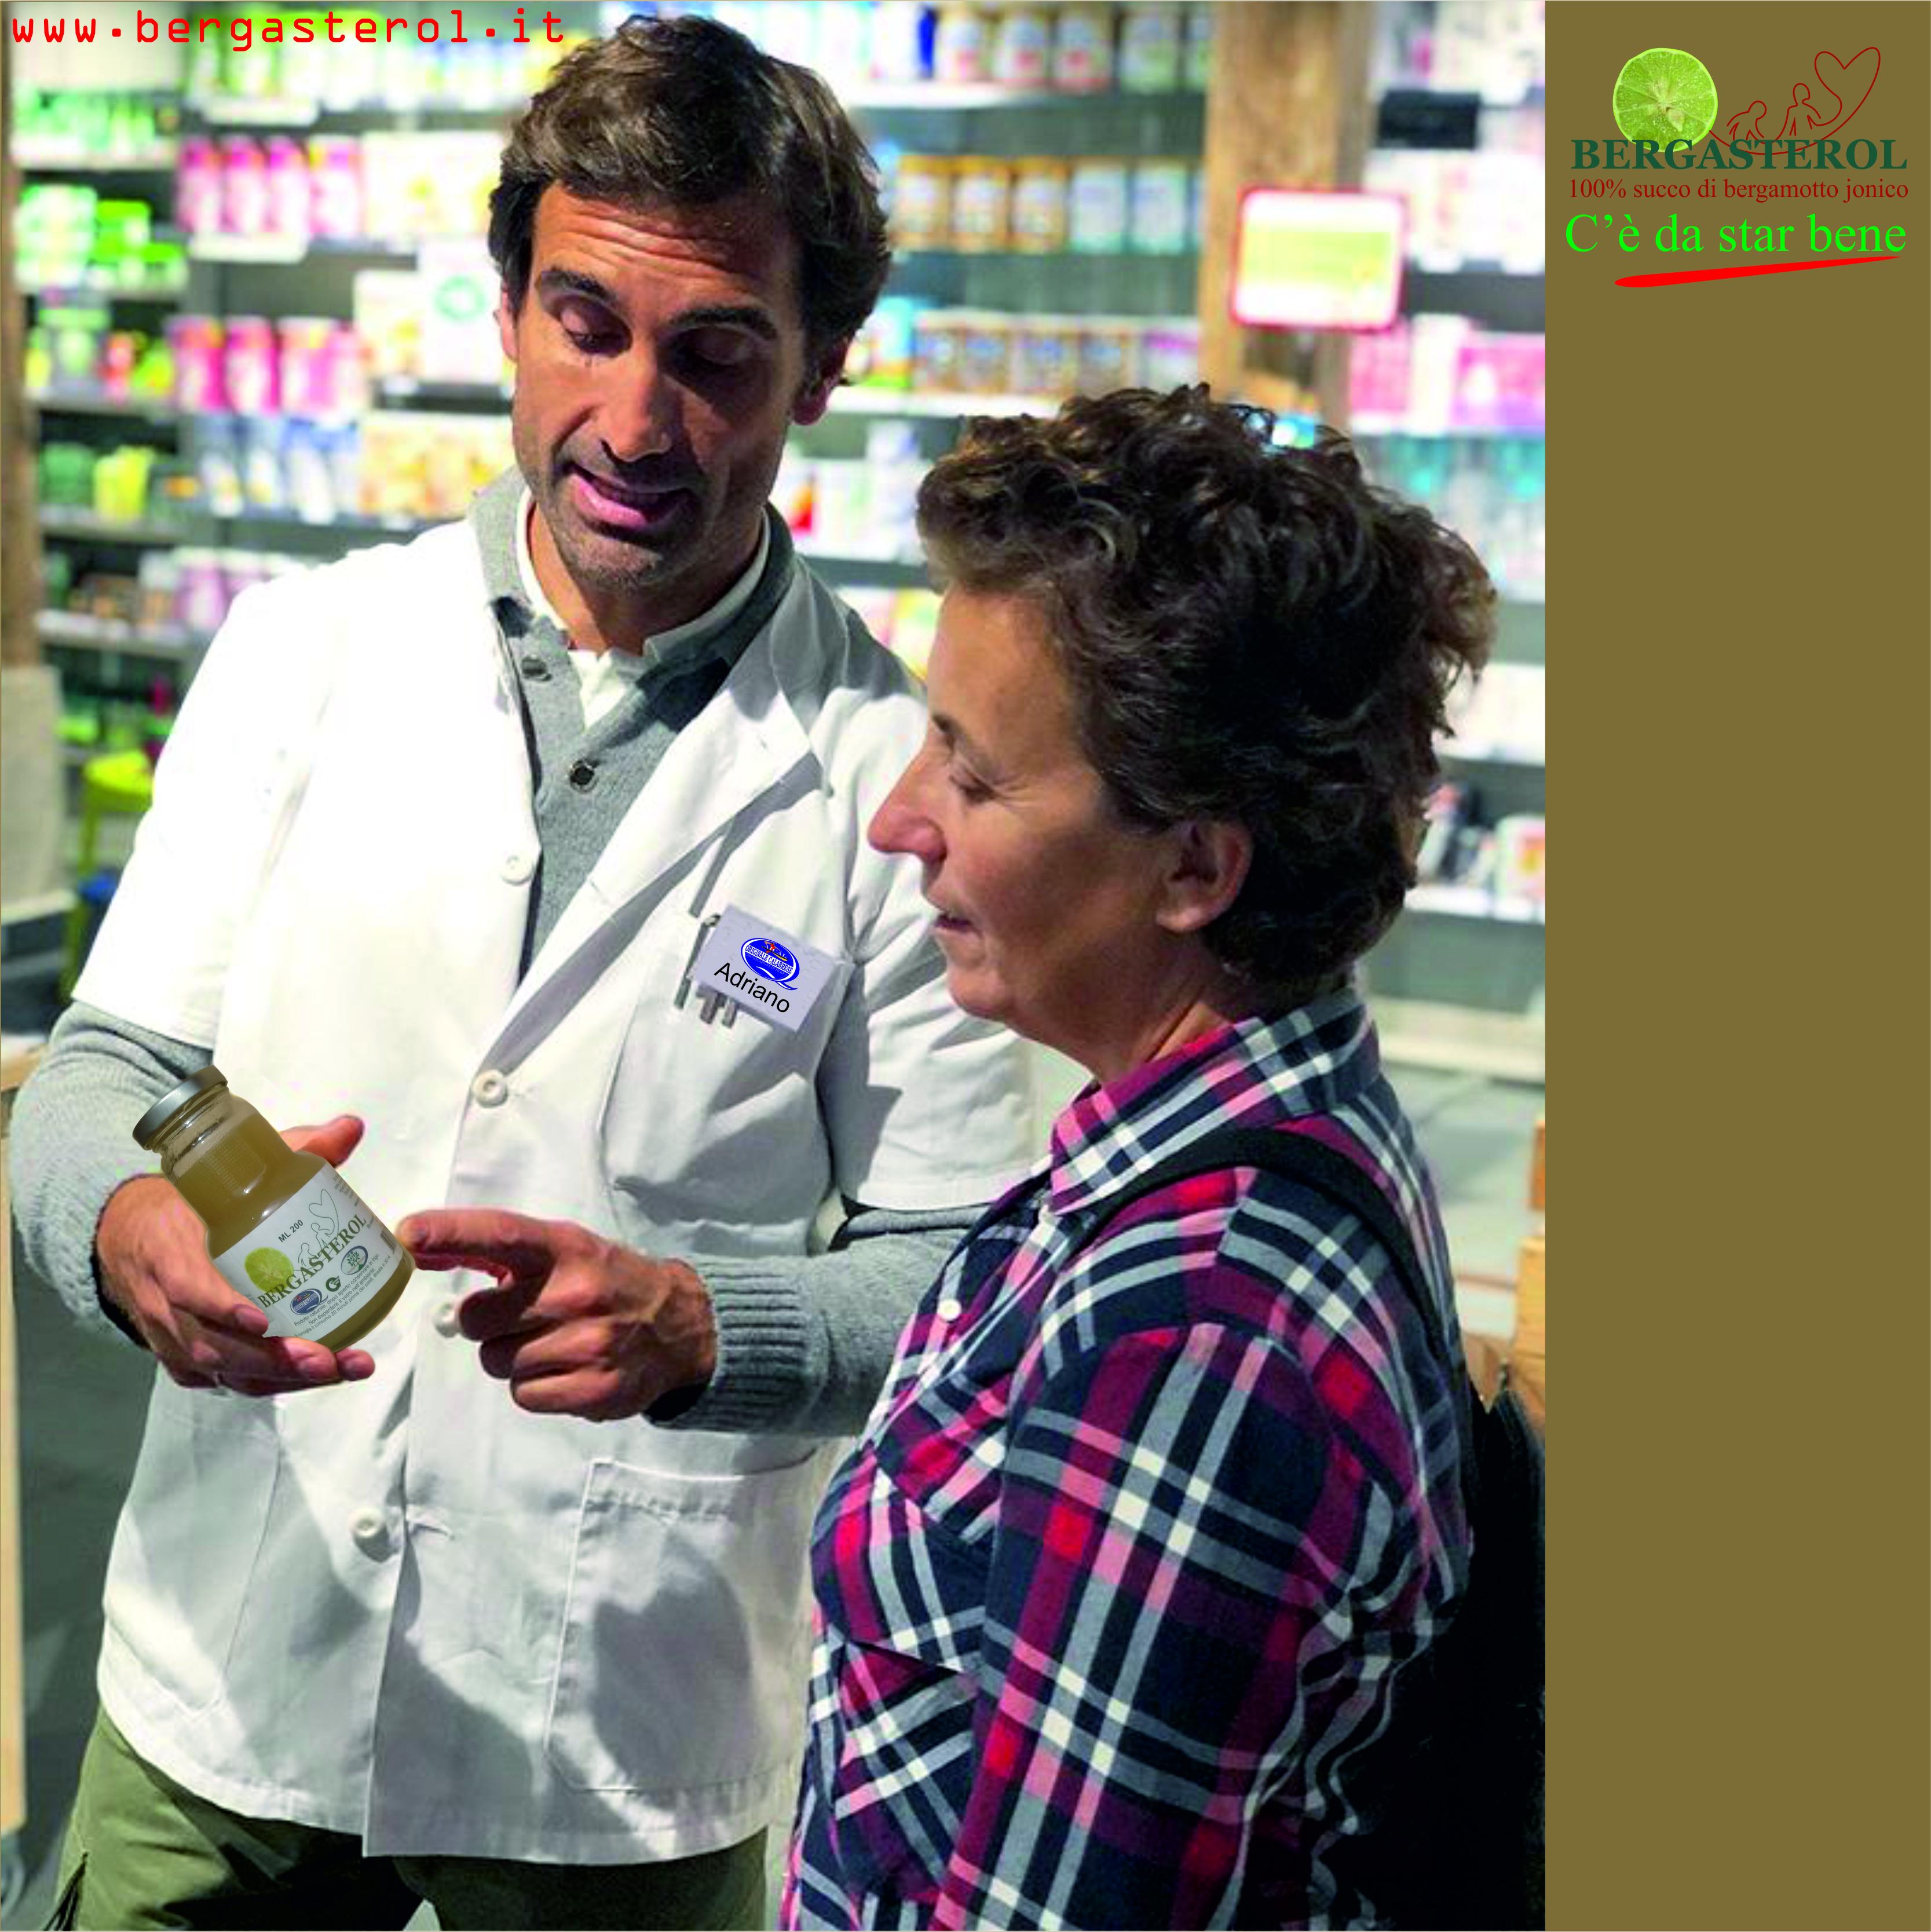 farmacia_bergasterol_2019